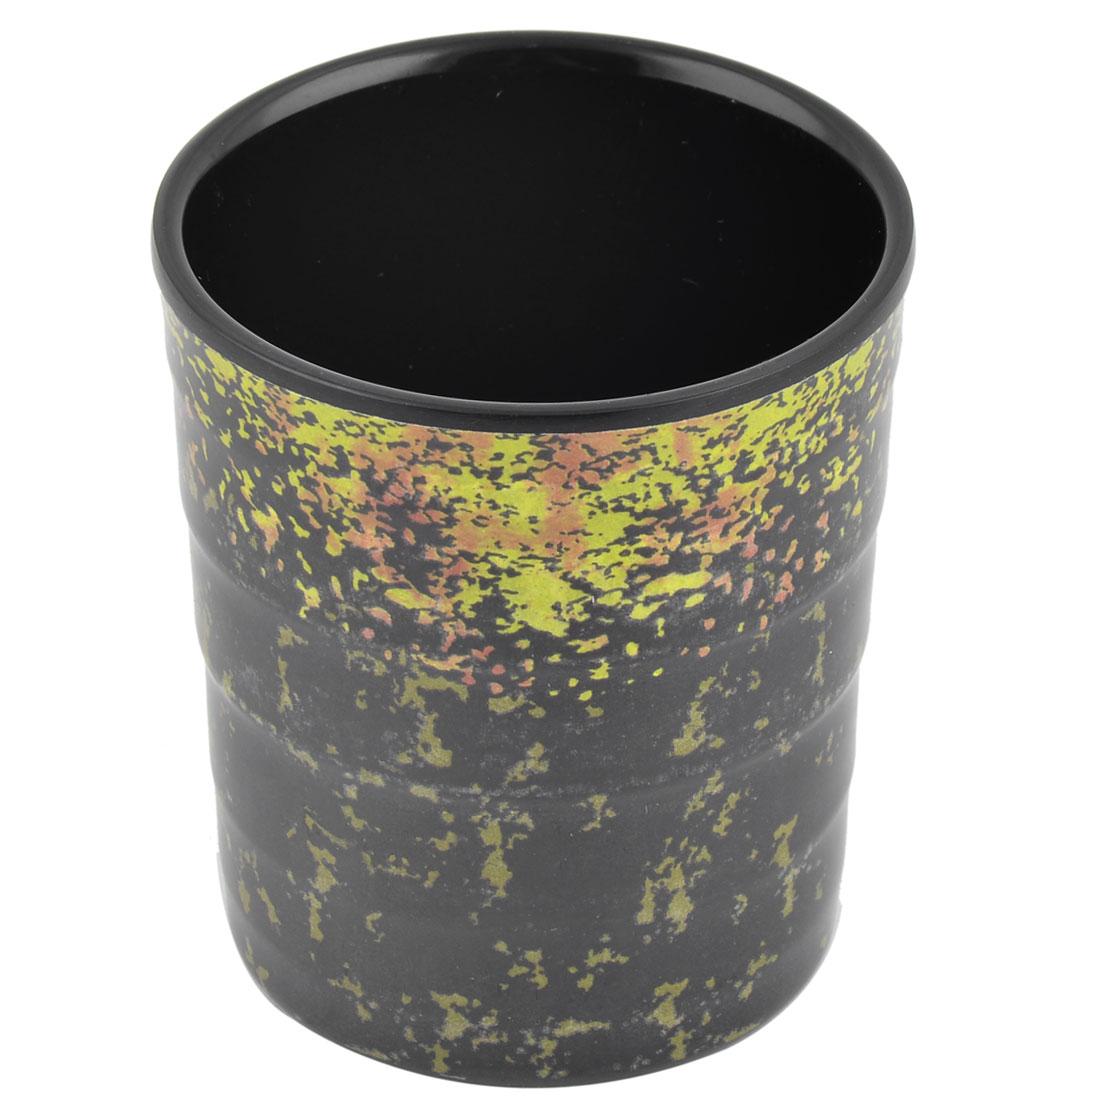 Restaurant Melamine Cylinder Tea Water Drinking Storage Cup Mug Black Yellow